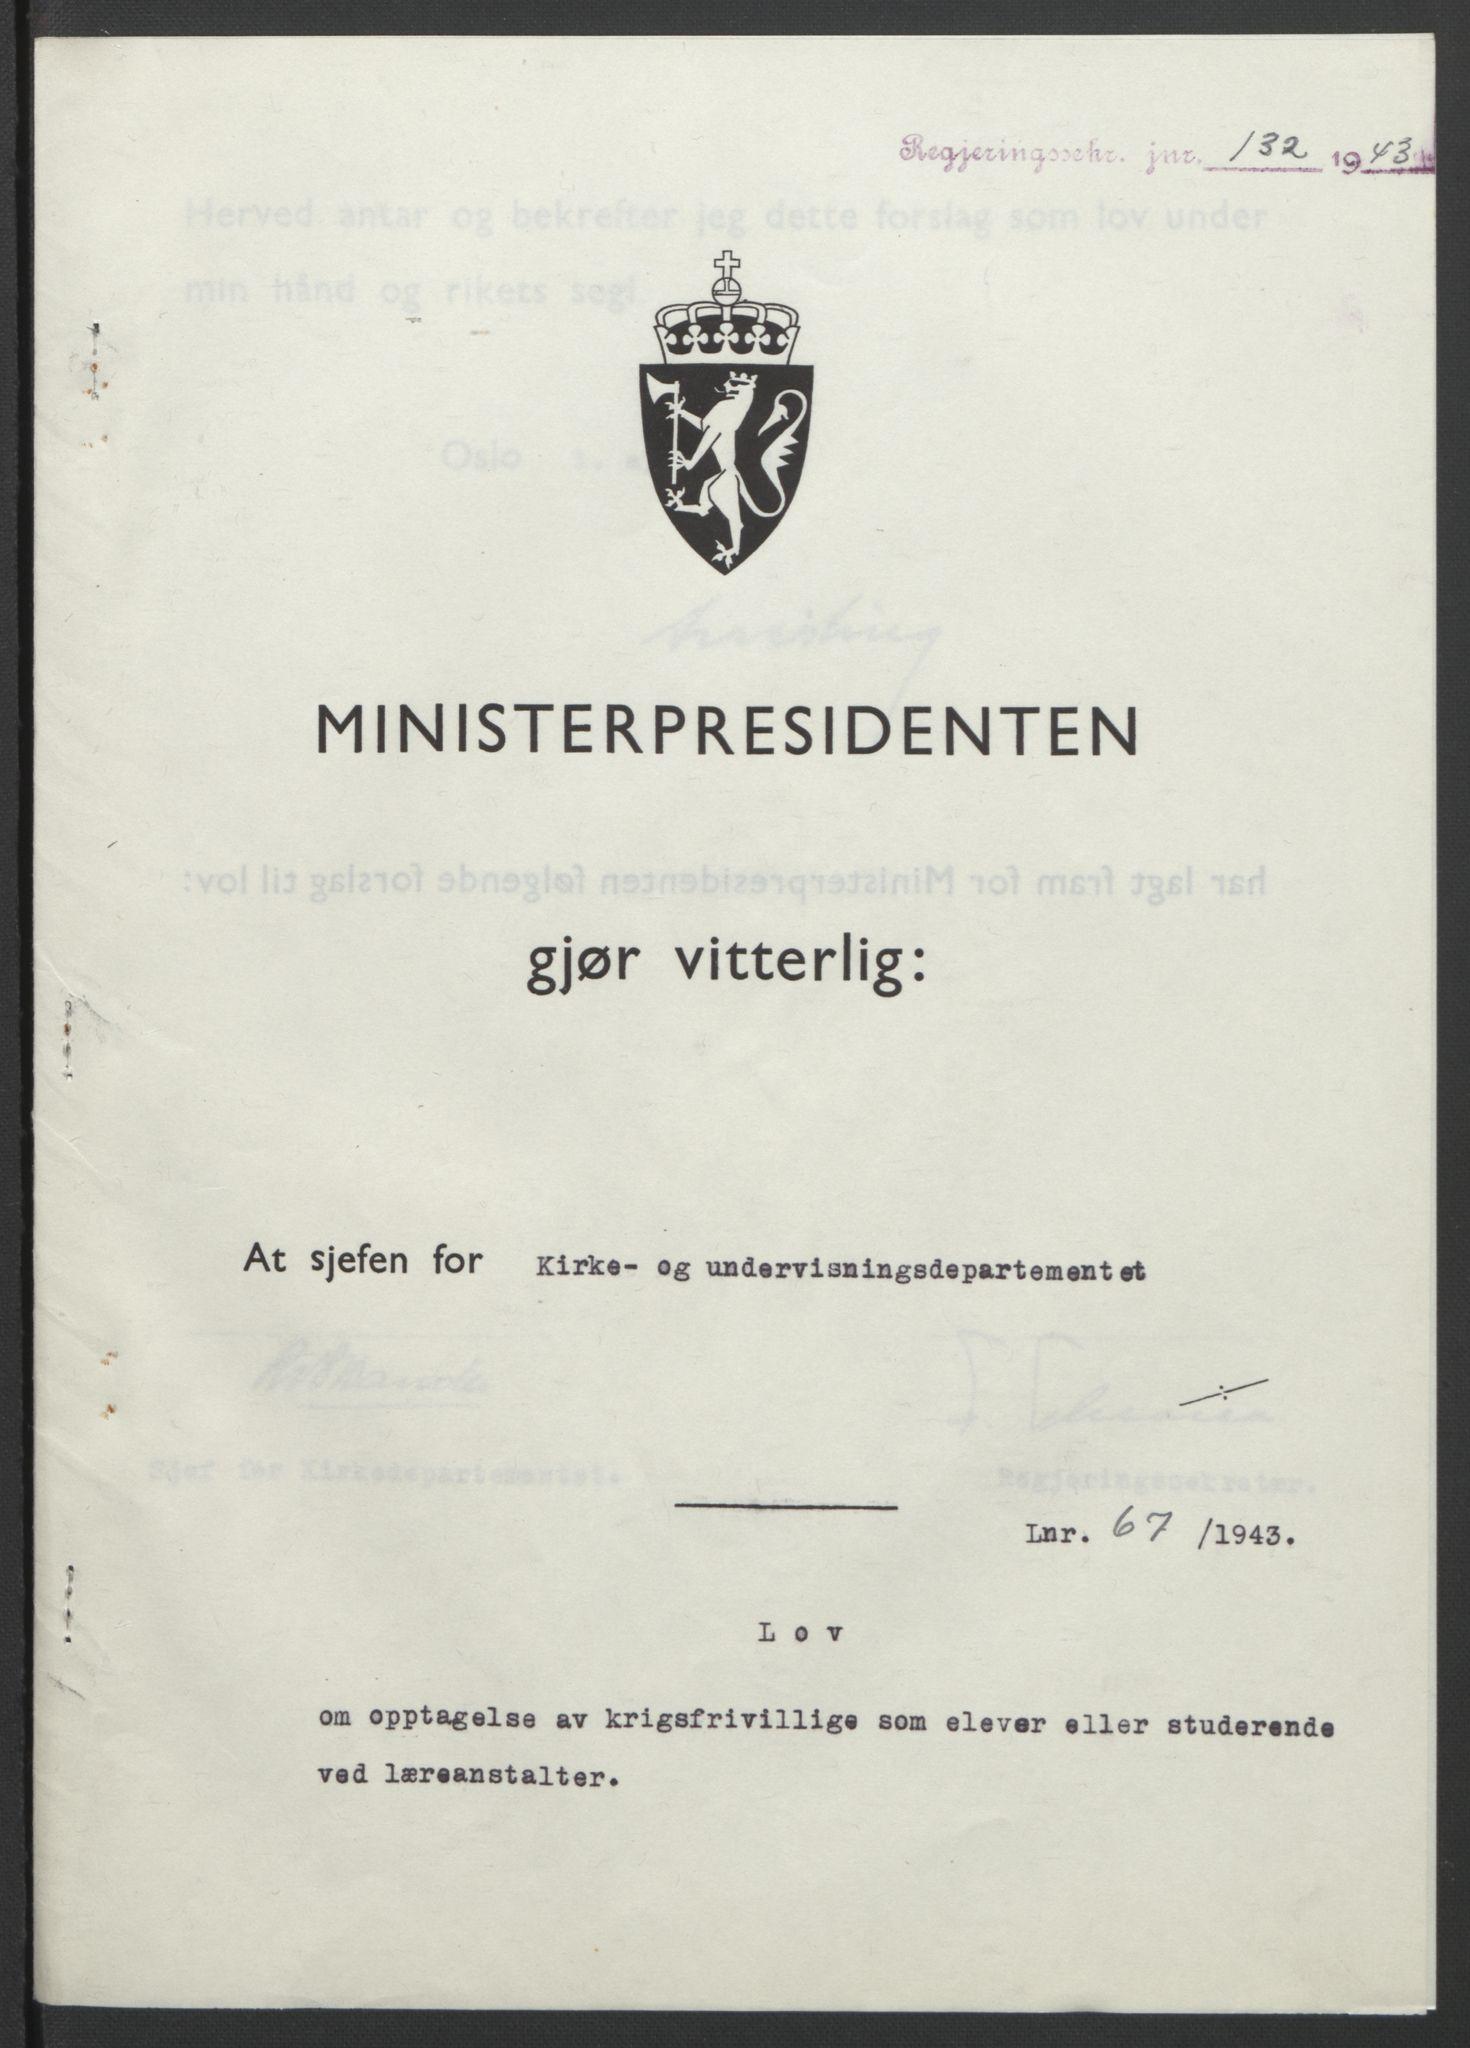 RA, NS-administrasjonen 1940-1945 (Statsrådsekretariatet, de kommisariske statsråder mm), D/Db/L0099: Lover, 1943, s. 308